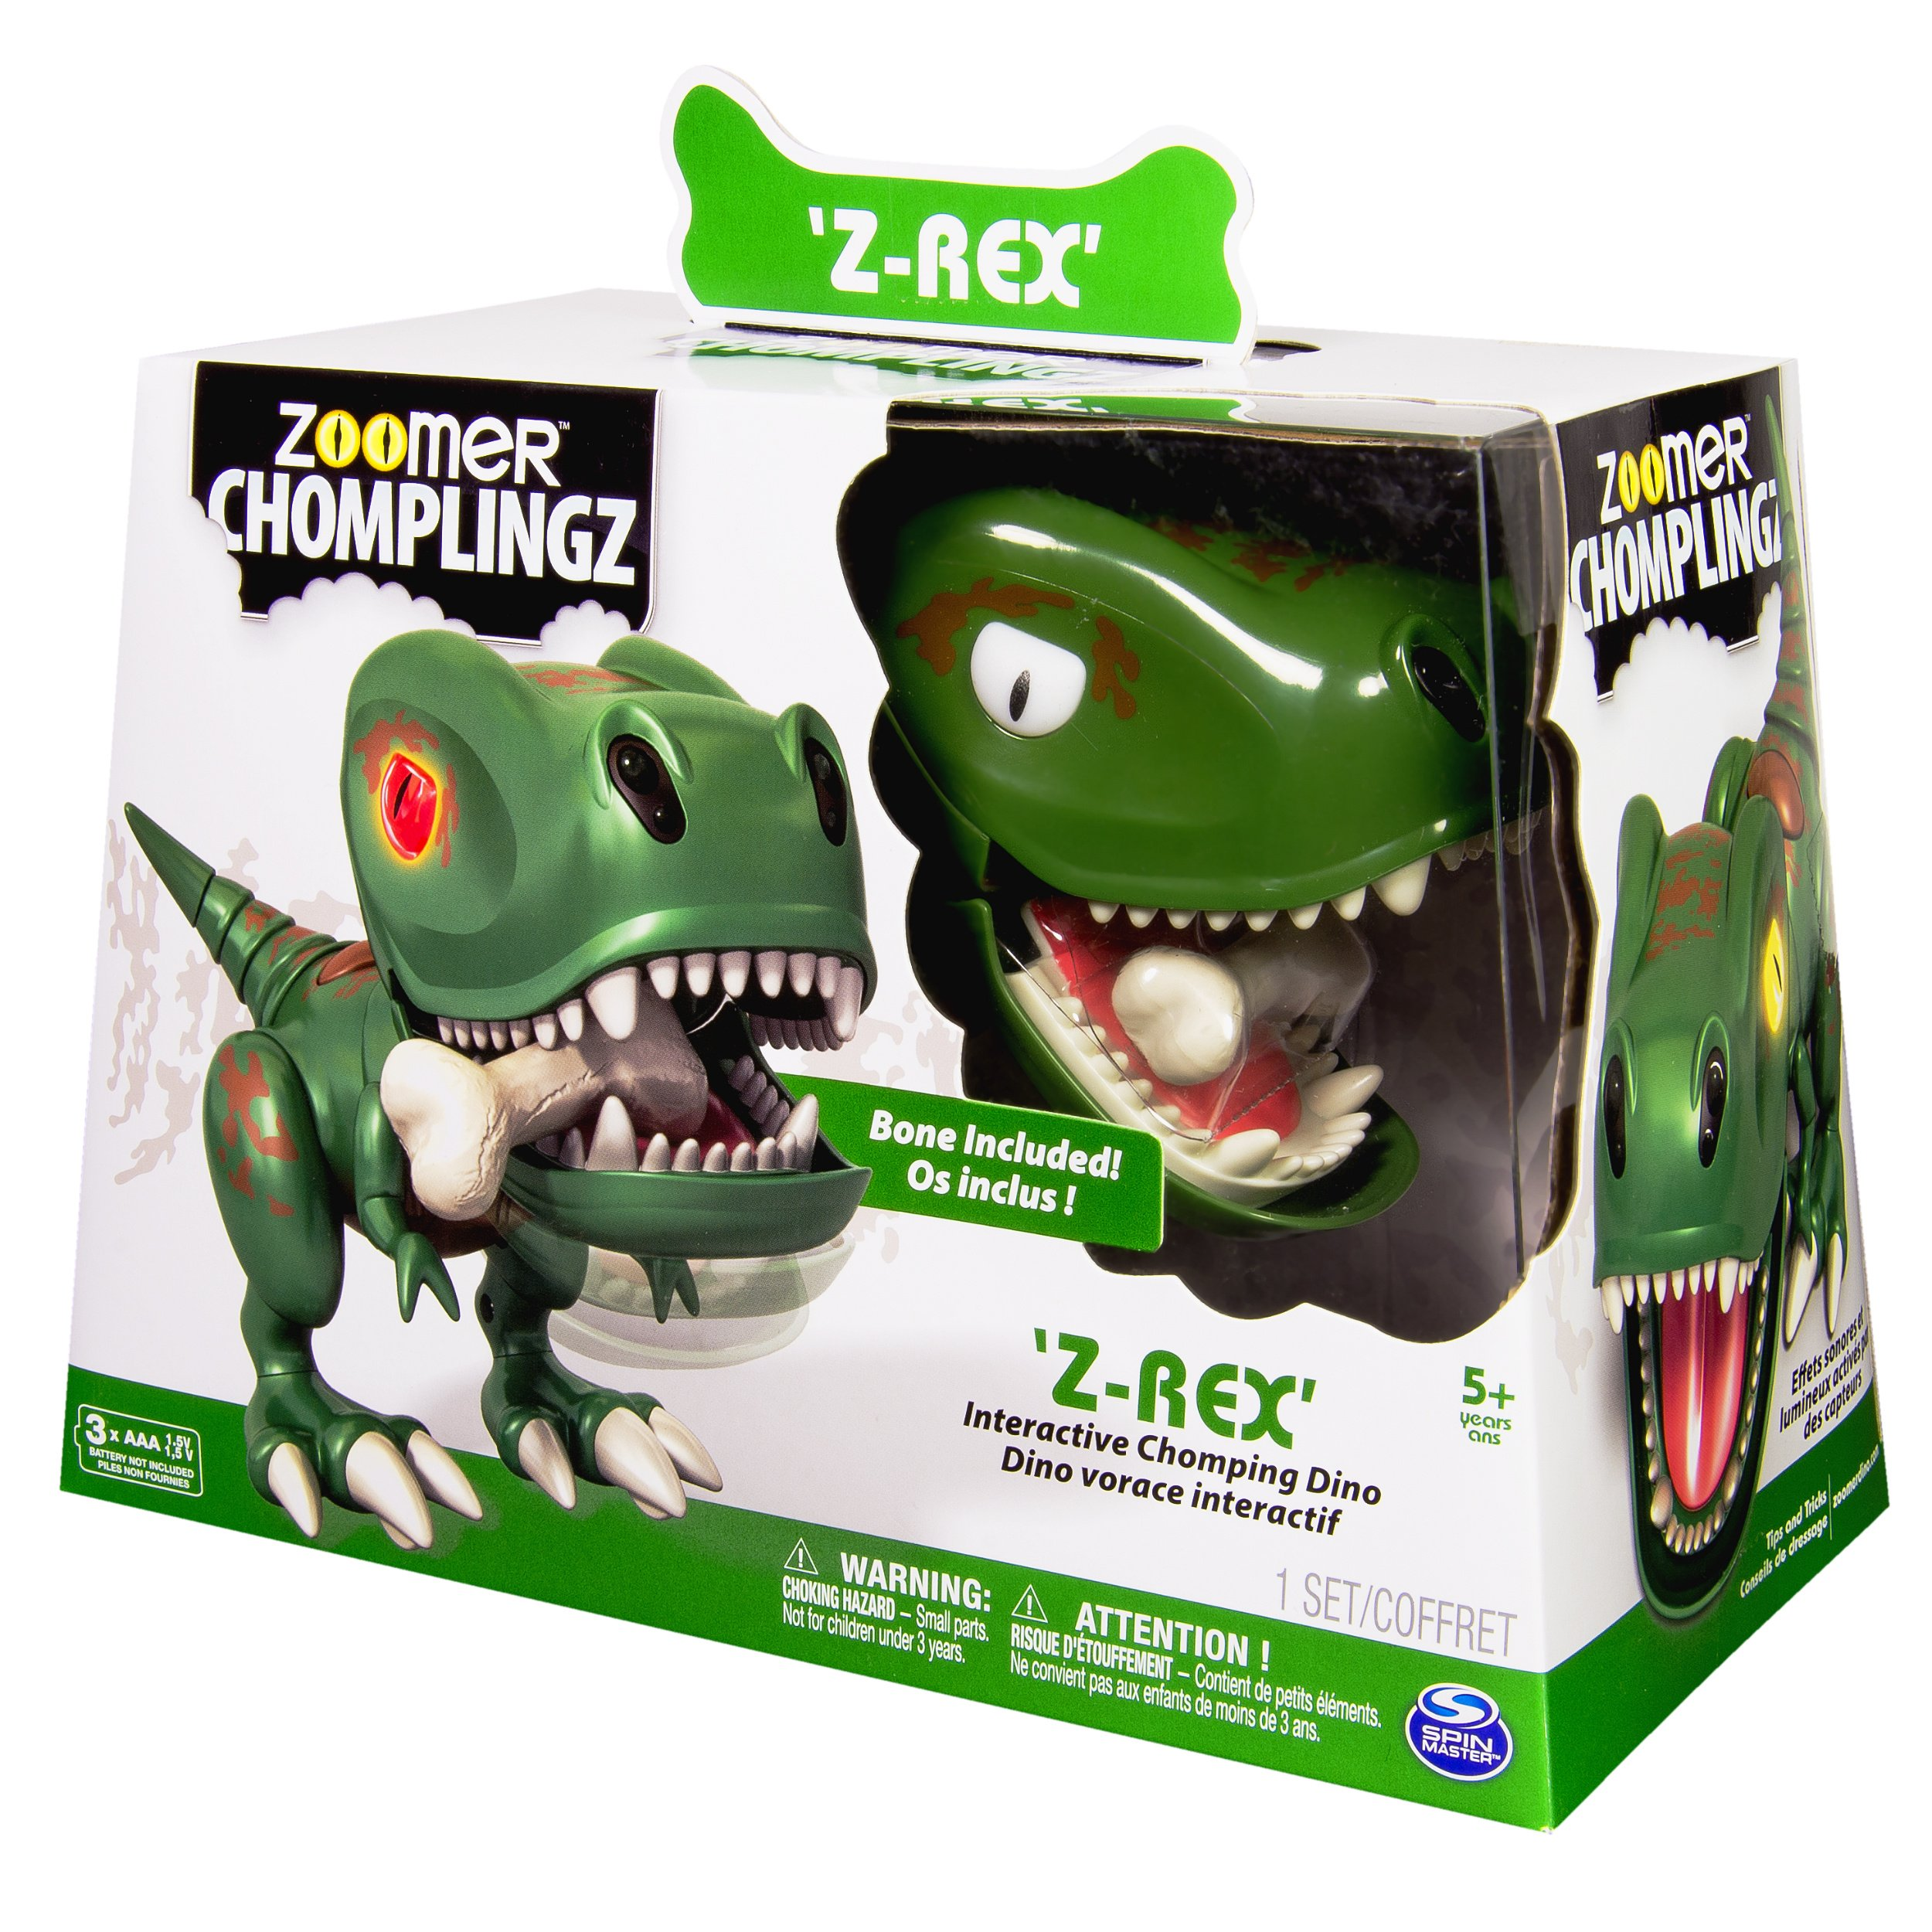 Zoomer Chomplingz – Z-Rex Interactive Dinosaur by zoomer (Image #3)